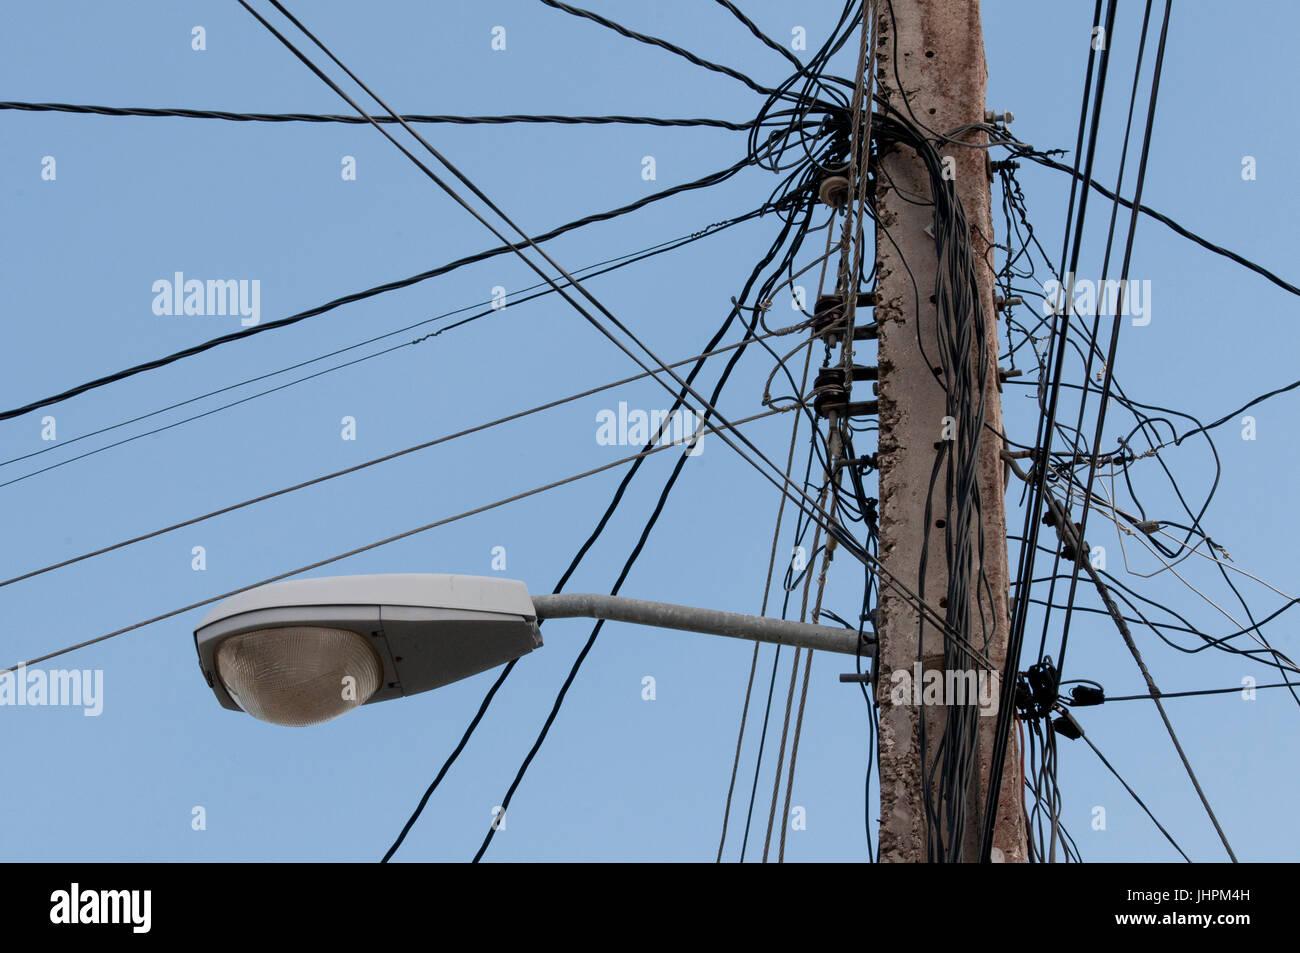 Elektrische Verkabelung auf Strommast in Kuba Stockbild